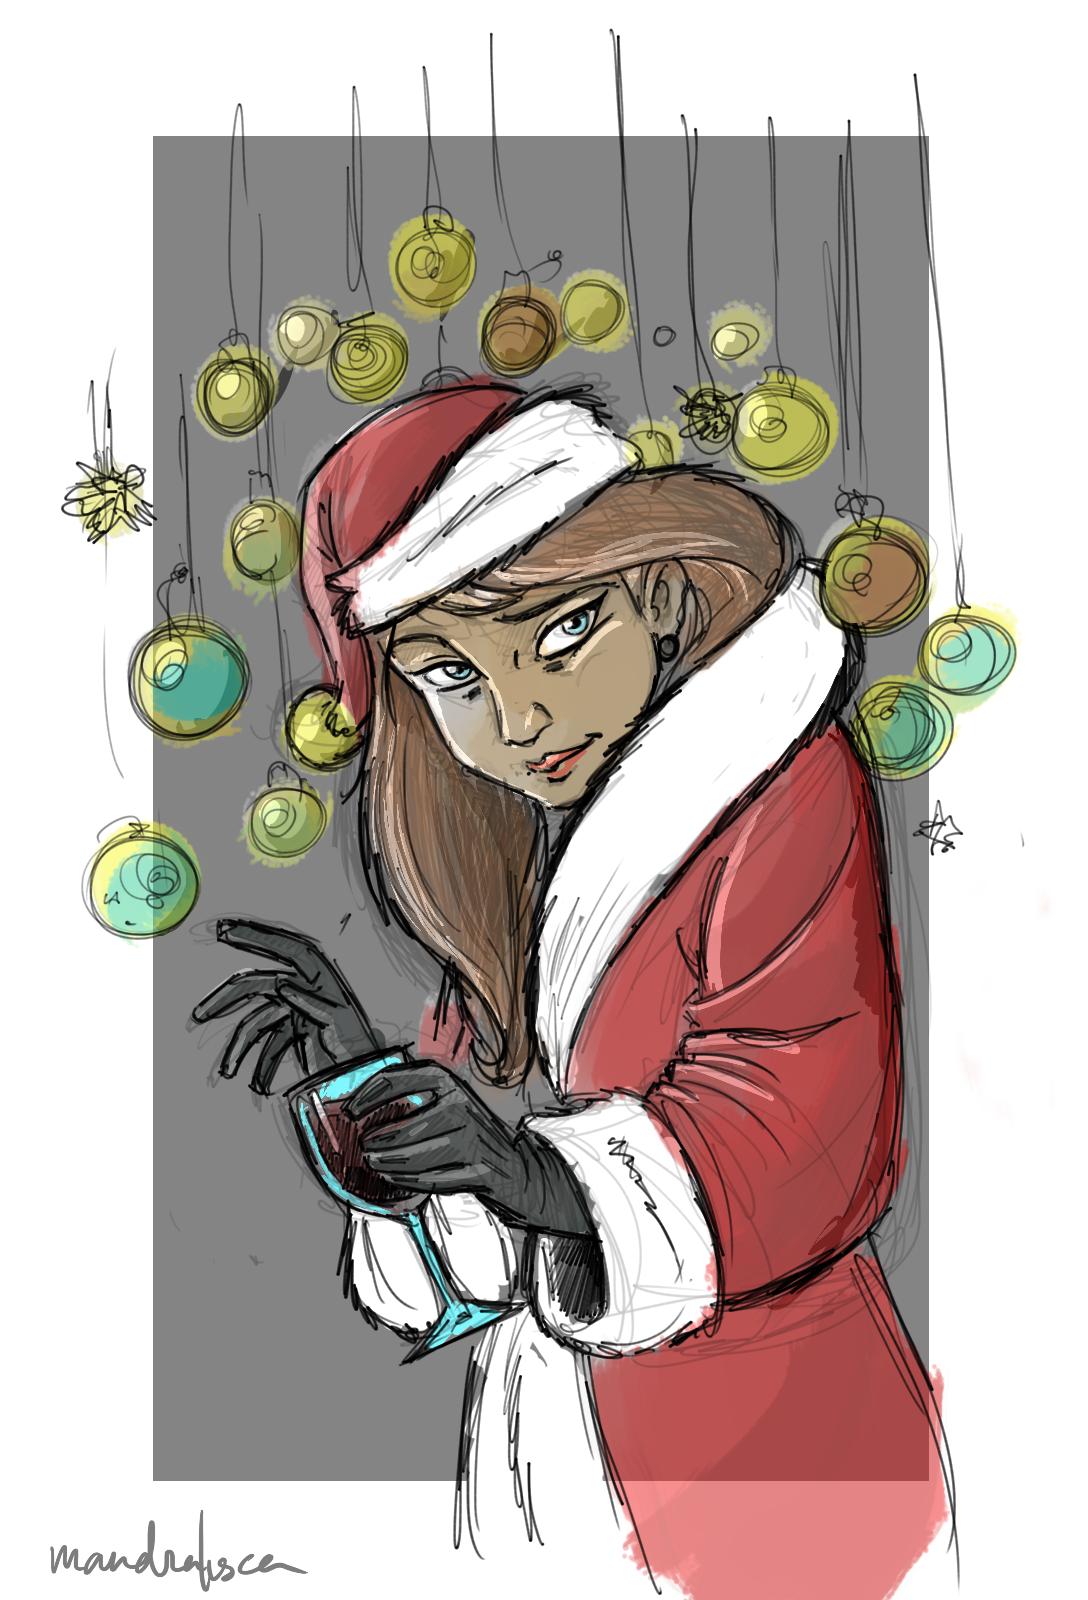 mandralisca: Buon Natale